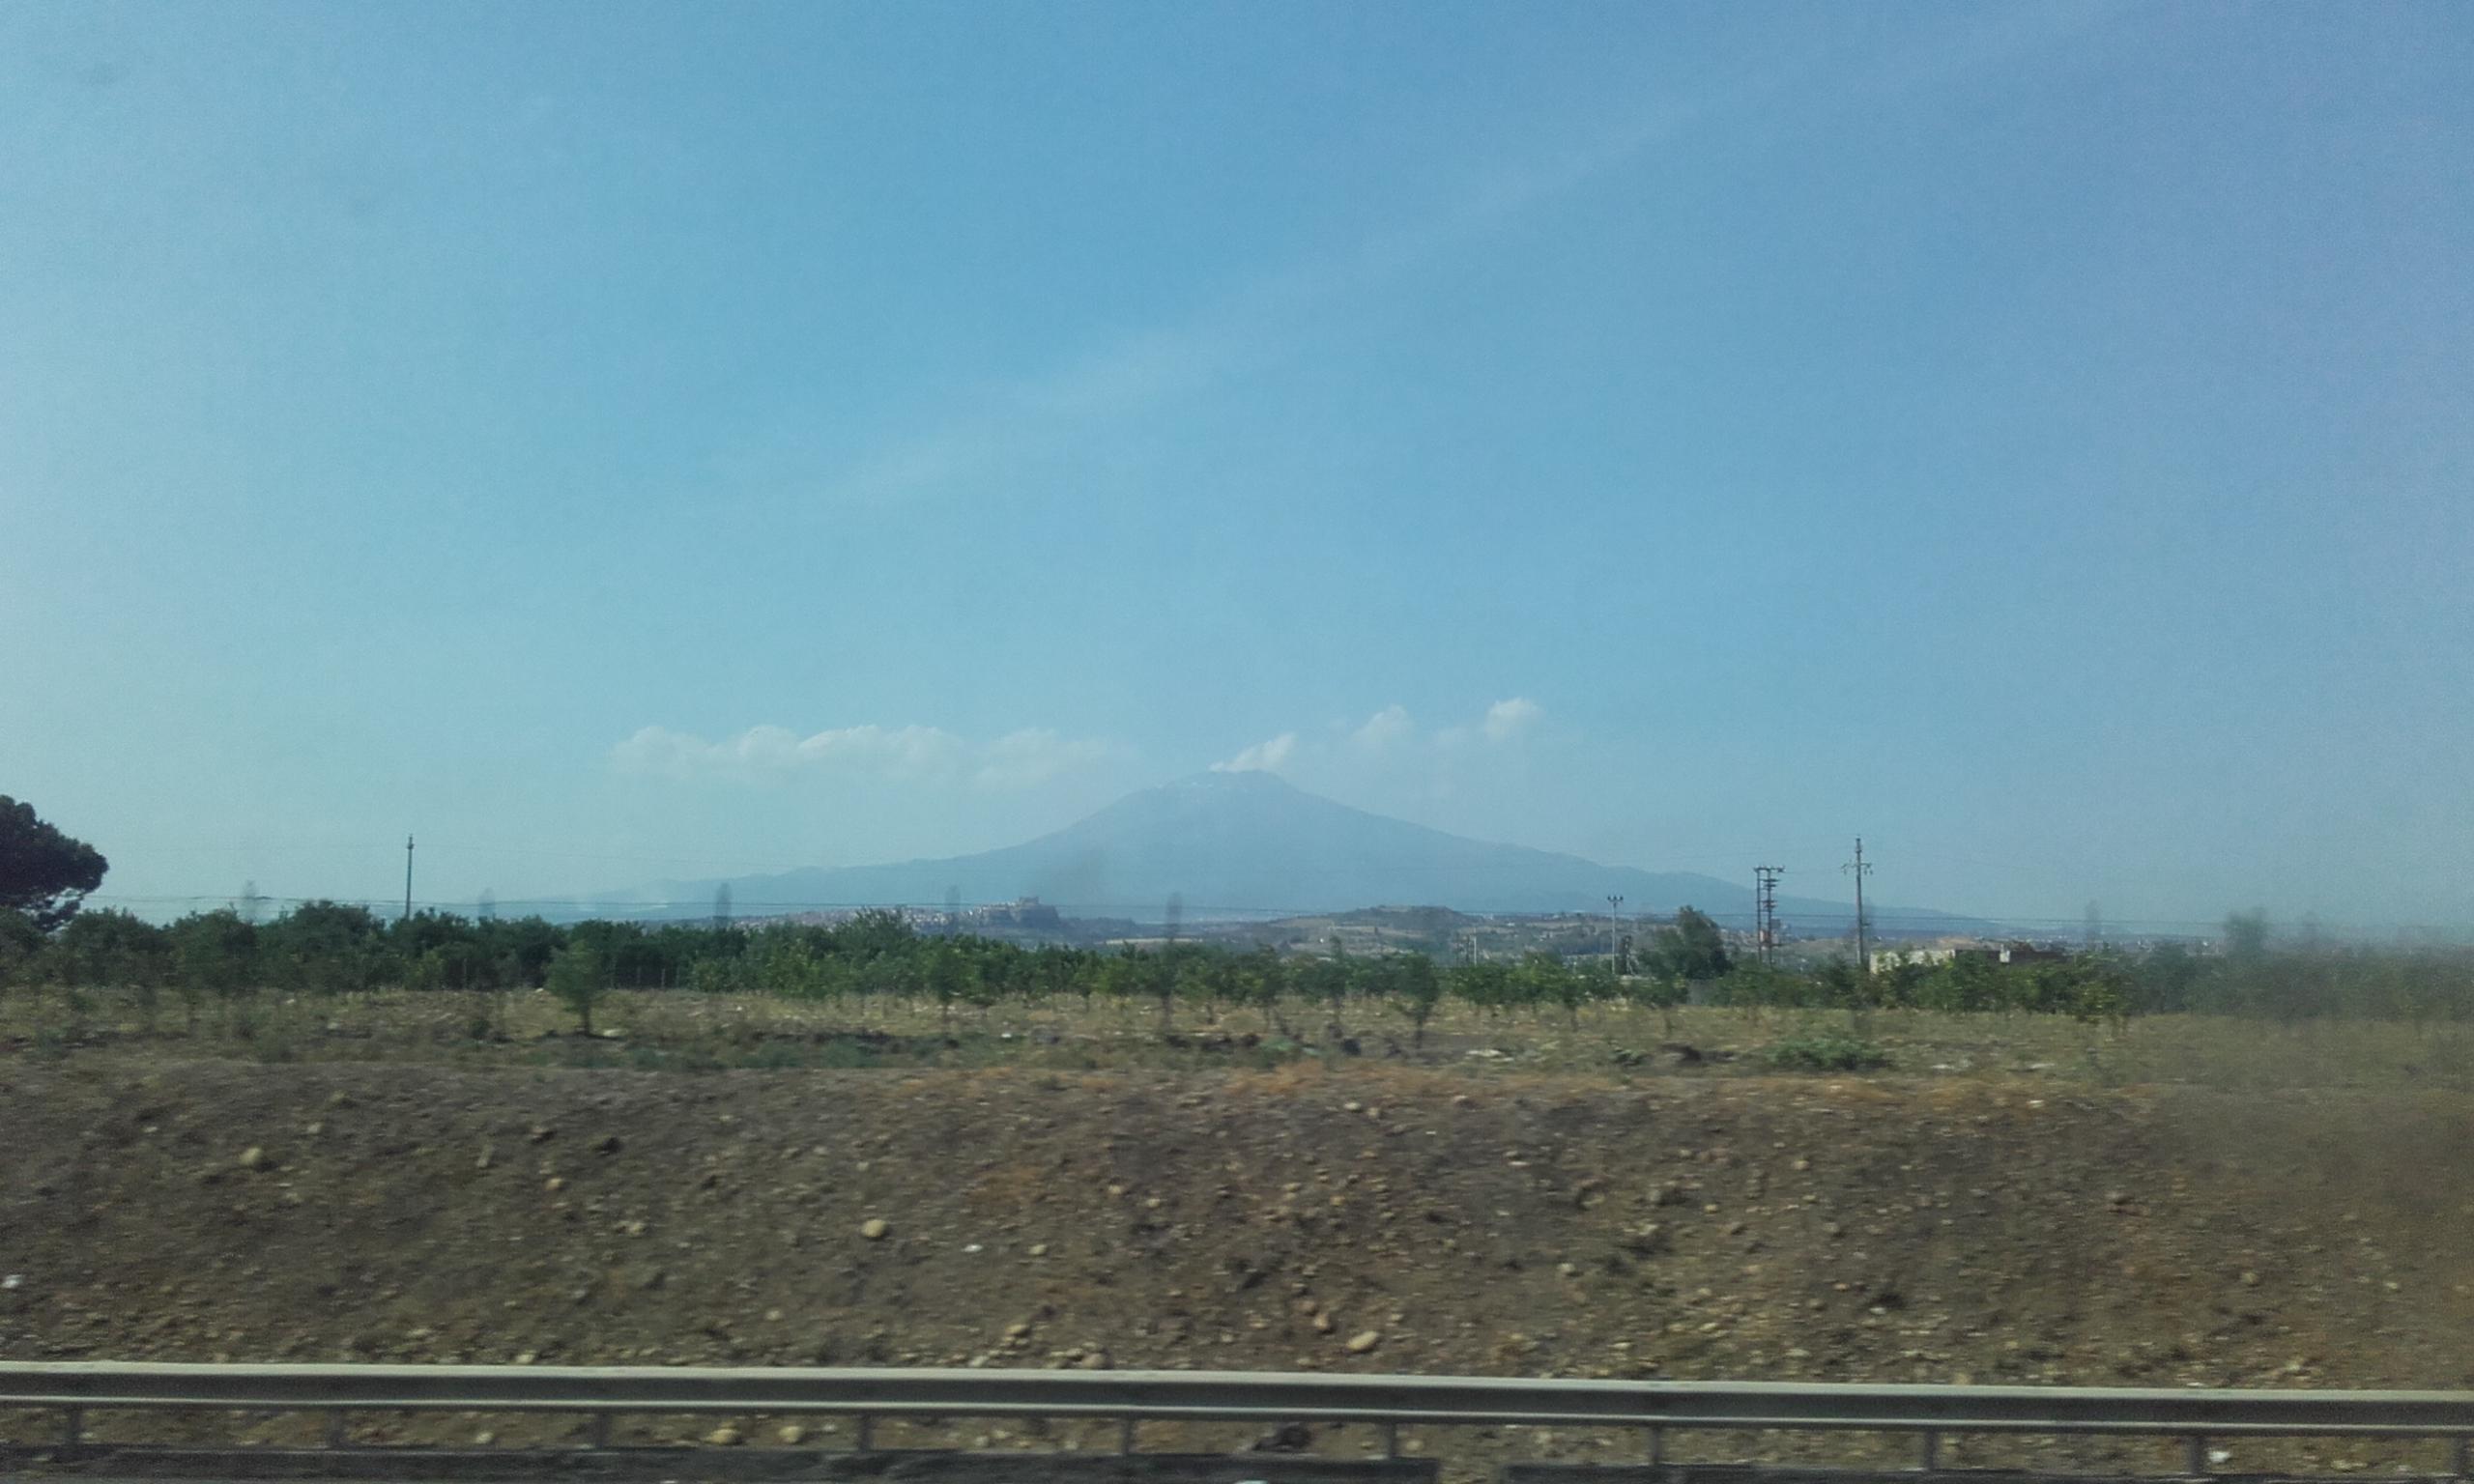 Volcán Etna en el horizonte